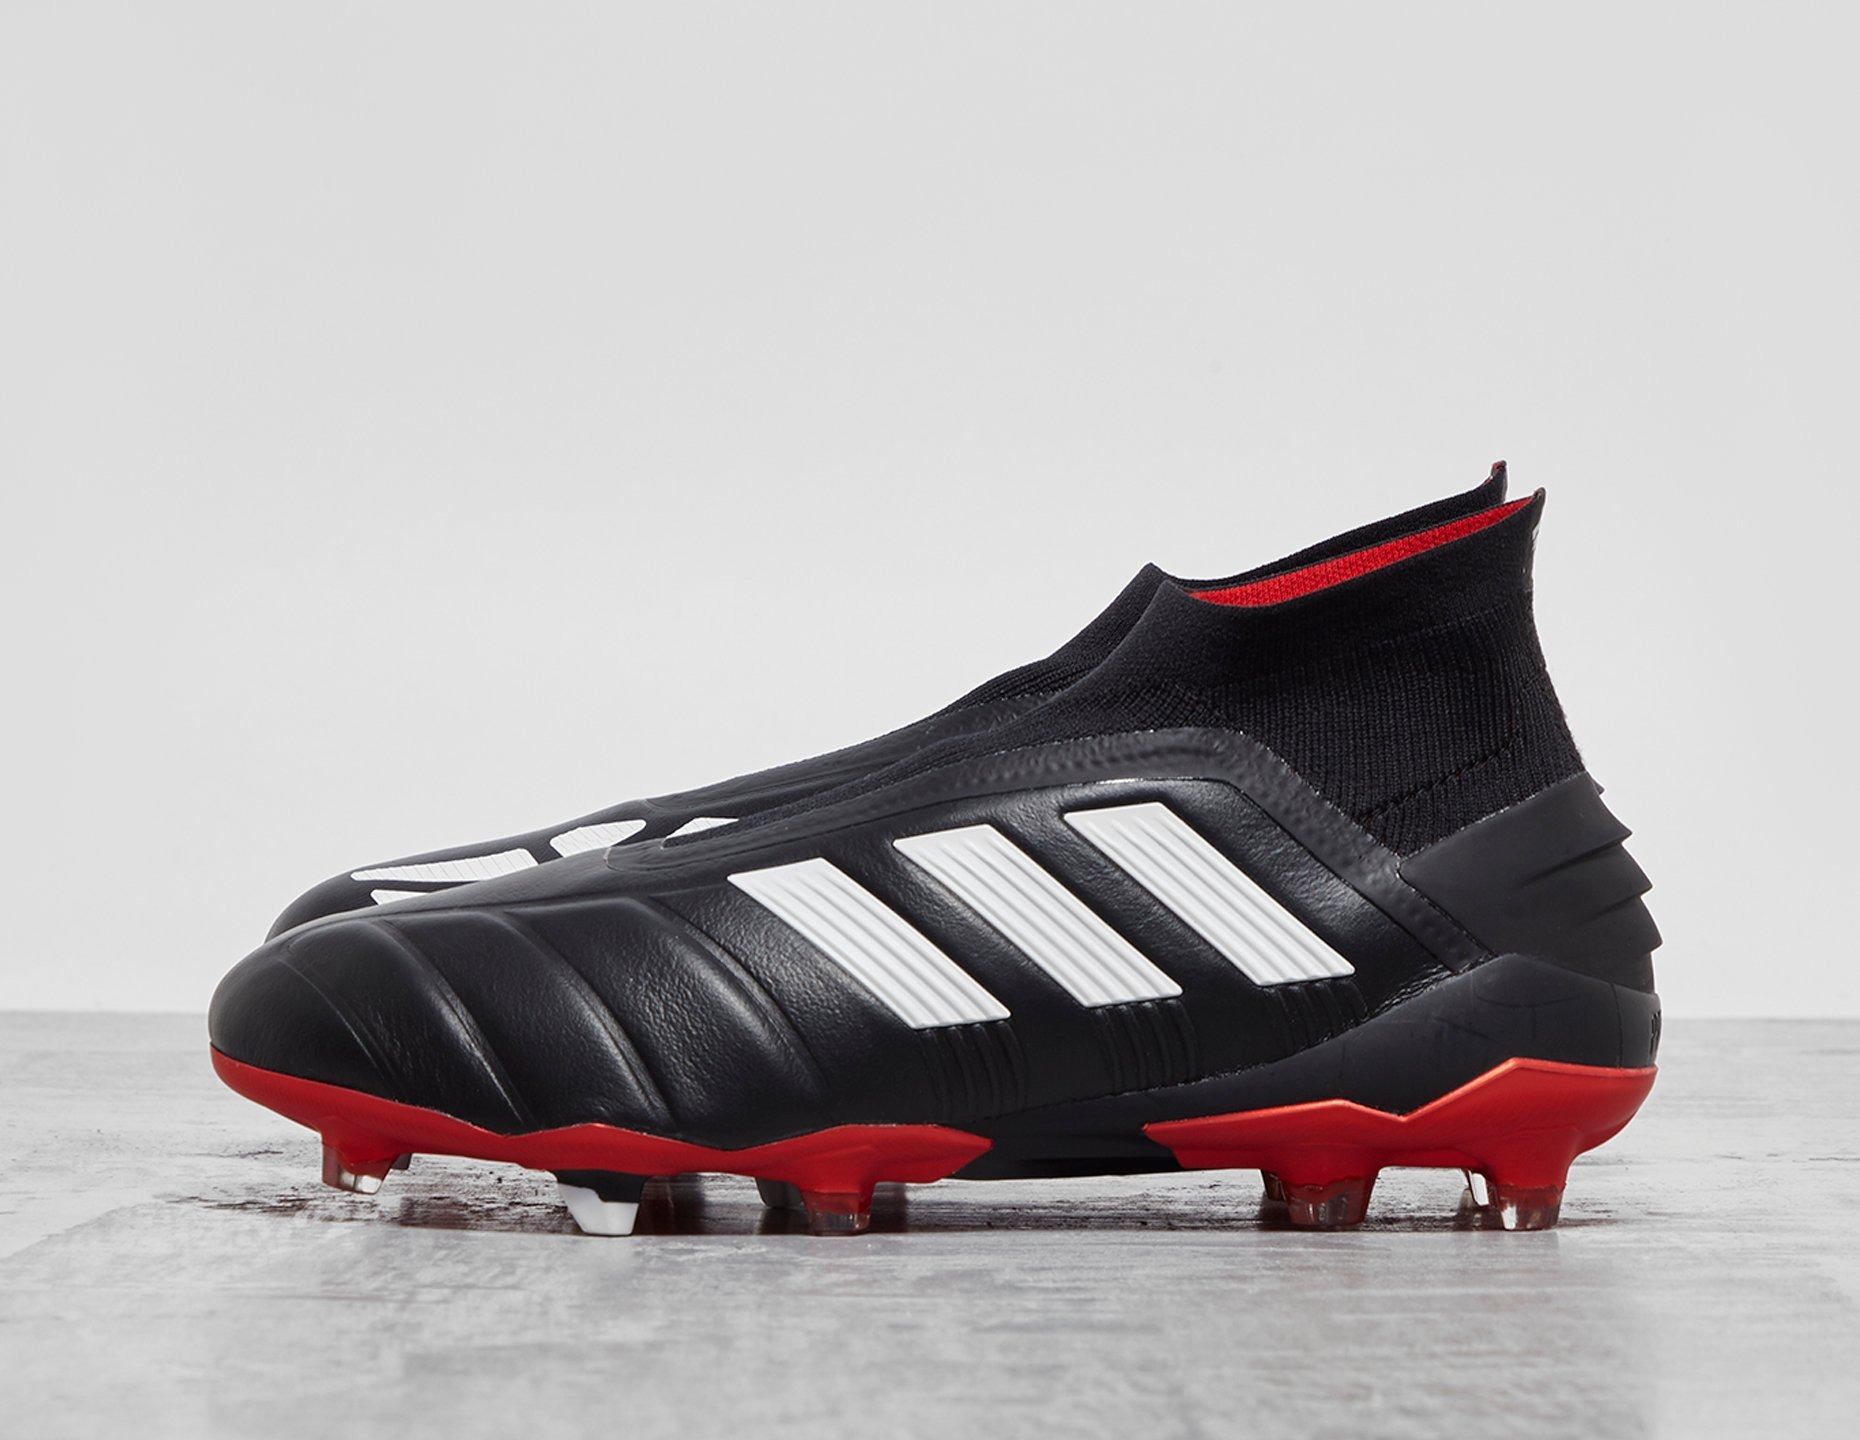 adidas Predator 19+ 25 Year Firm Ground Boots | Footpatrol